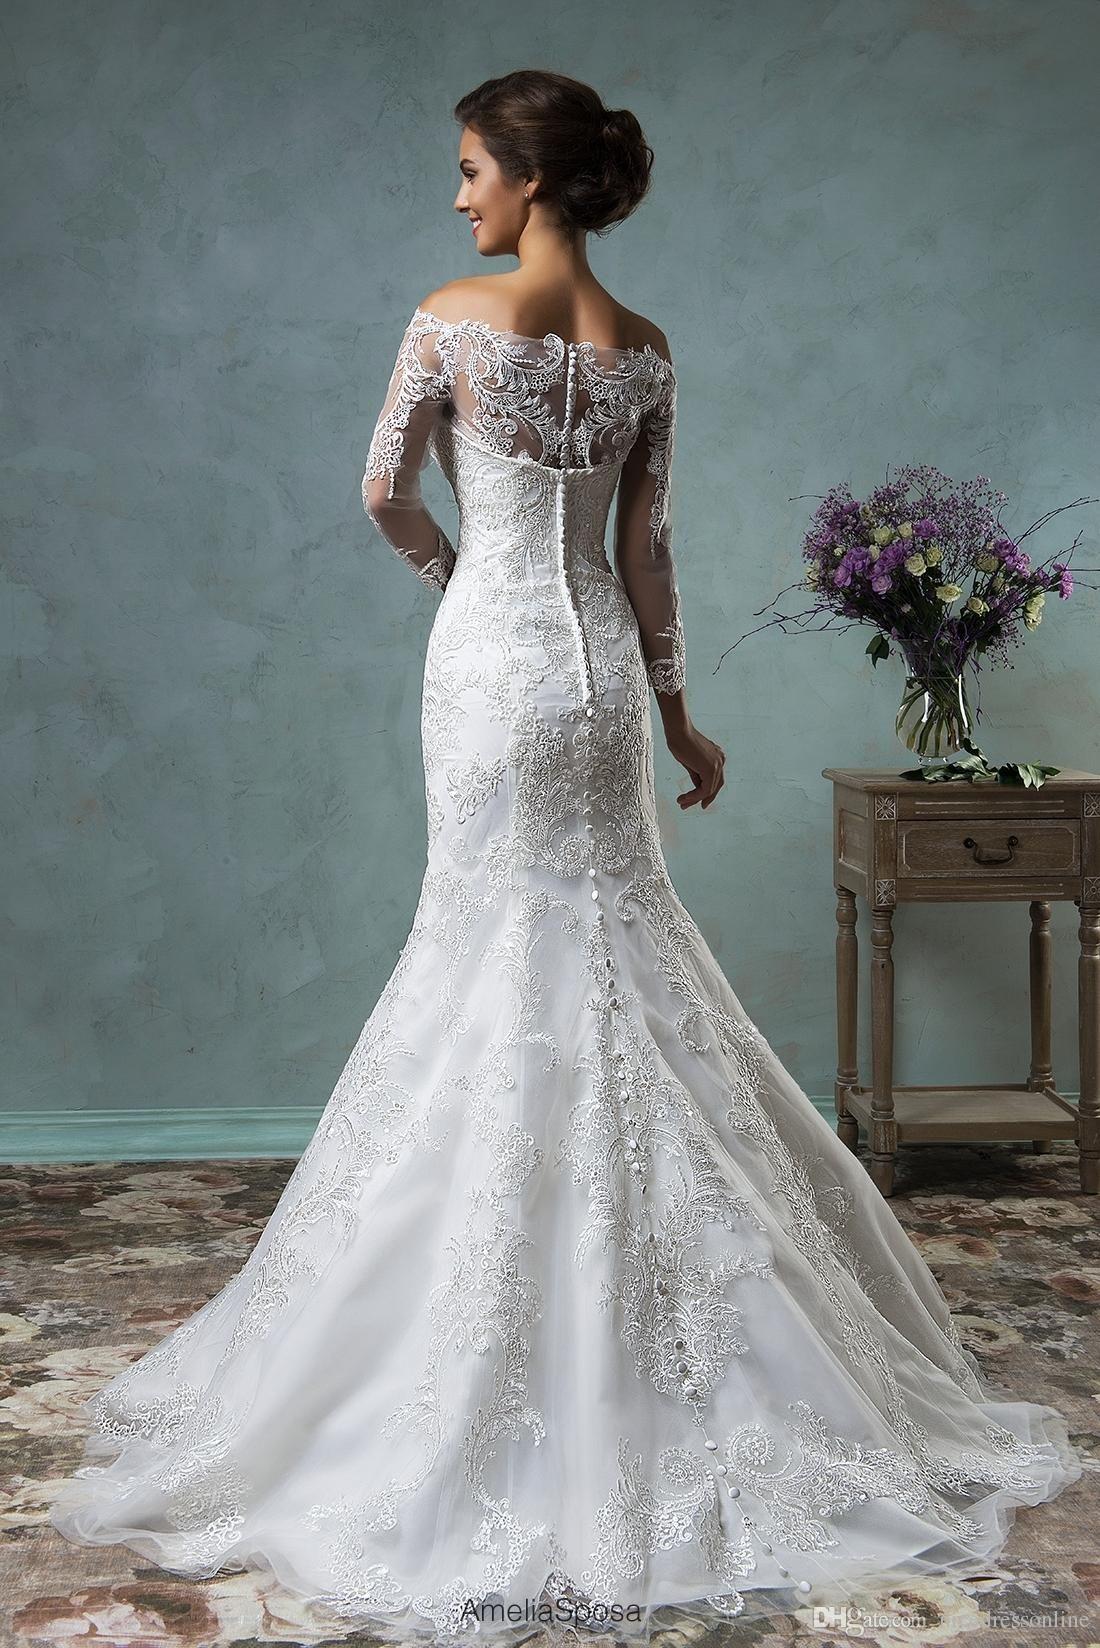 Detachable skirt wedding dress  Amelia Sposa  Sexy Muslim Wedding Dresses with Removable Skirt